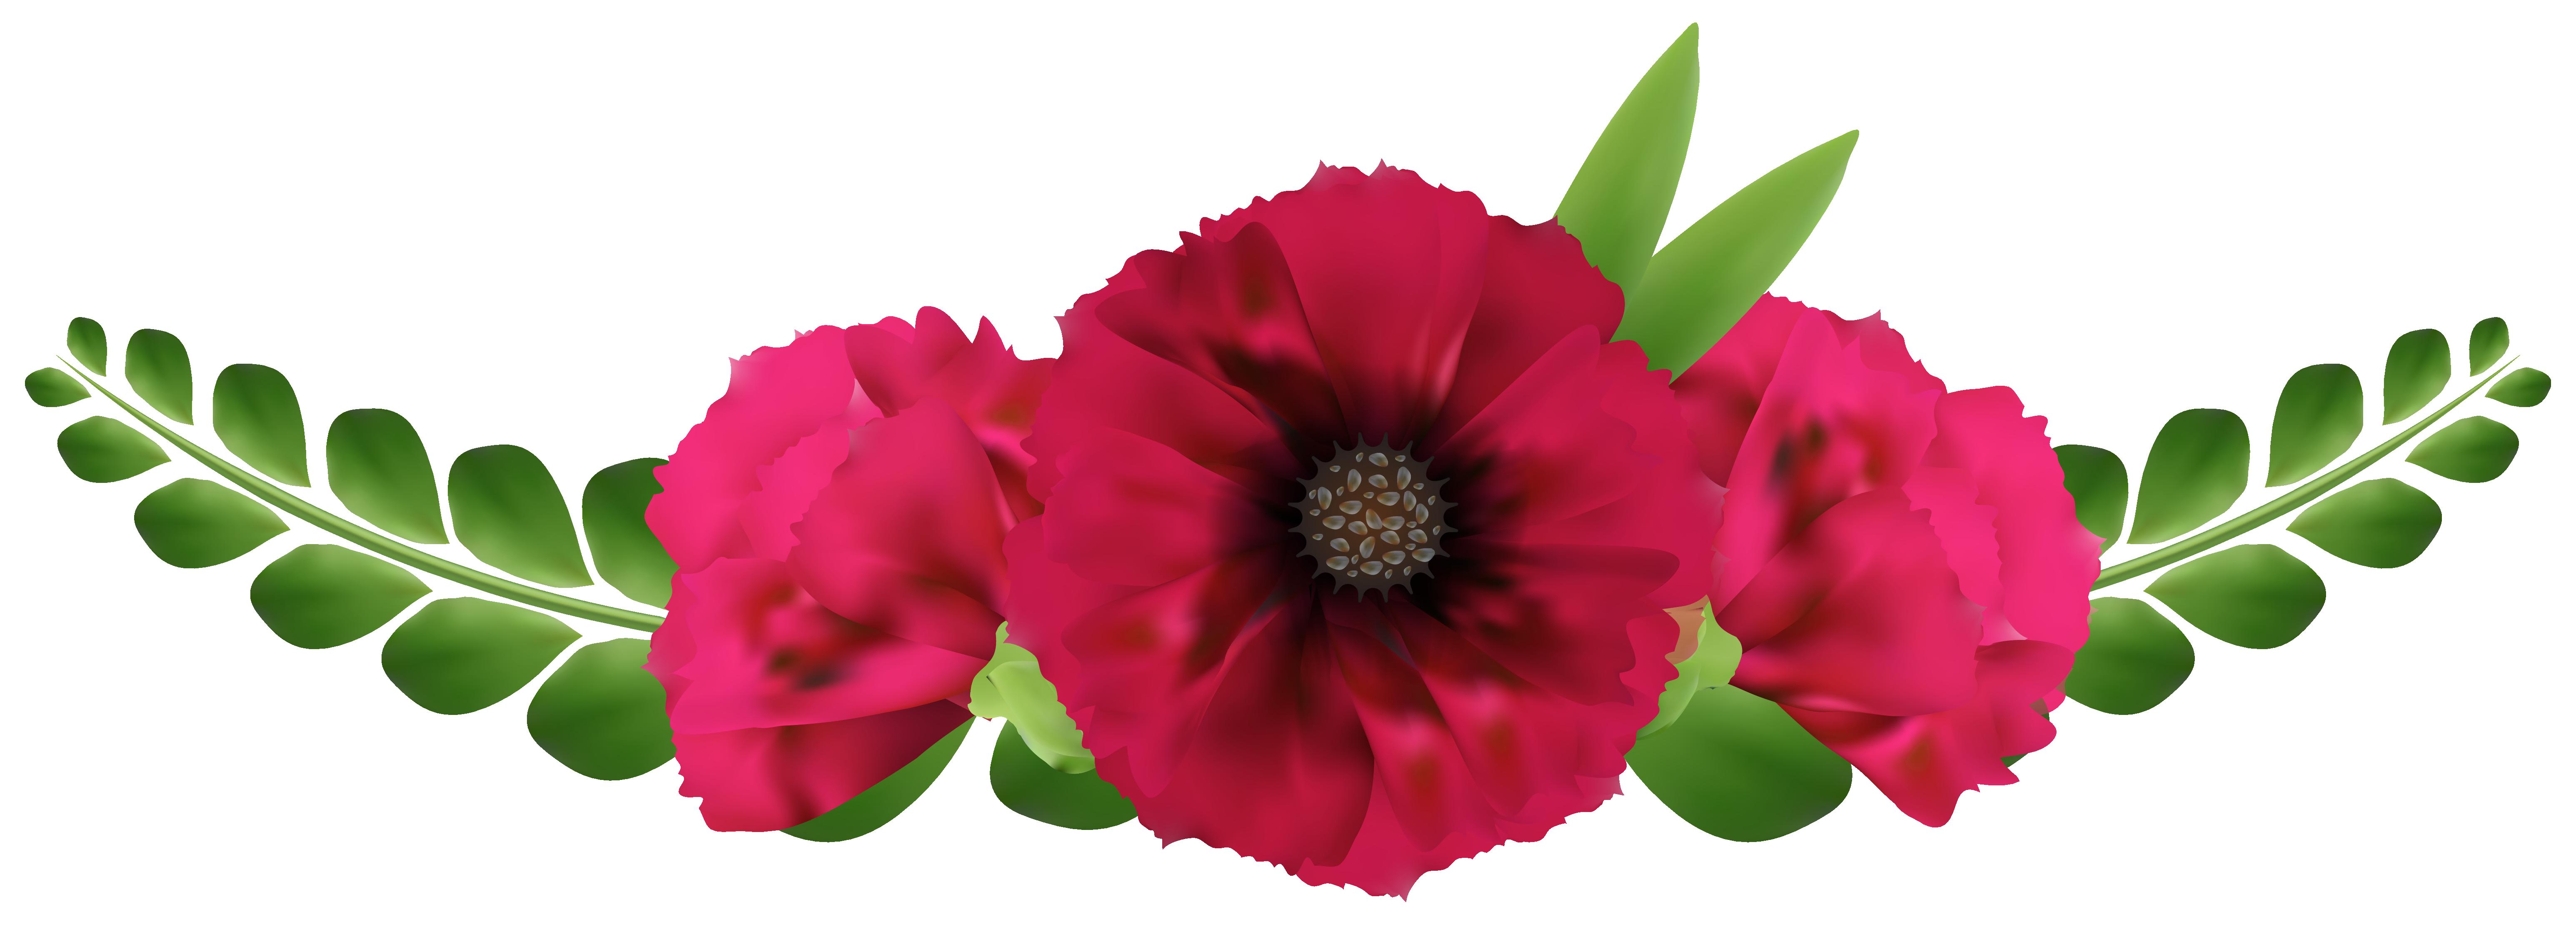 Bouquet clipart beautiful flower 2017 Flower Flowers Png Bouquet